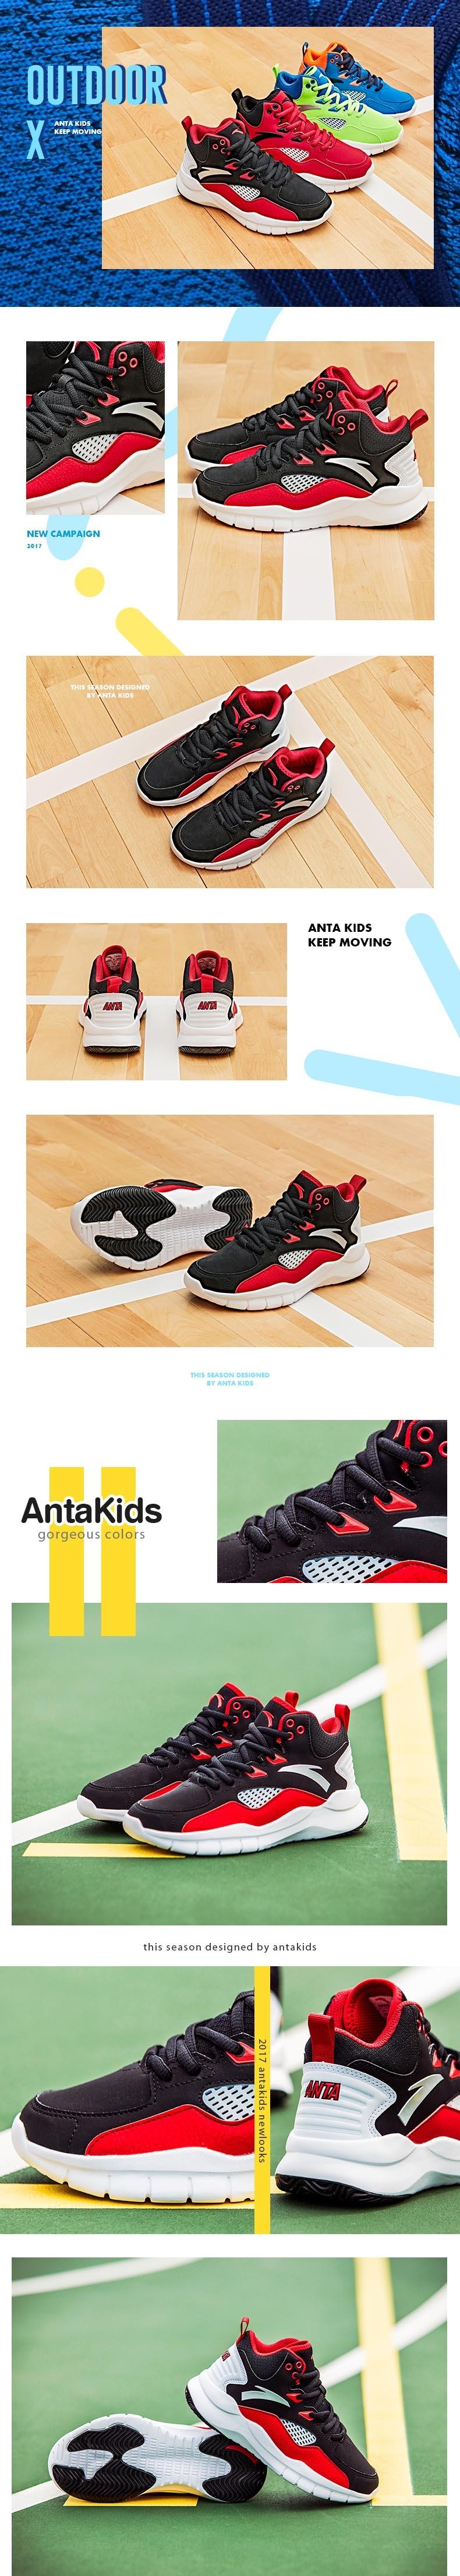 Anta 2018 Fall Kids Basketball Shoes | Anta Kids Sneakers